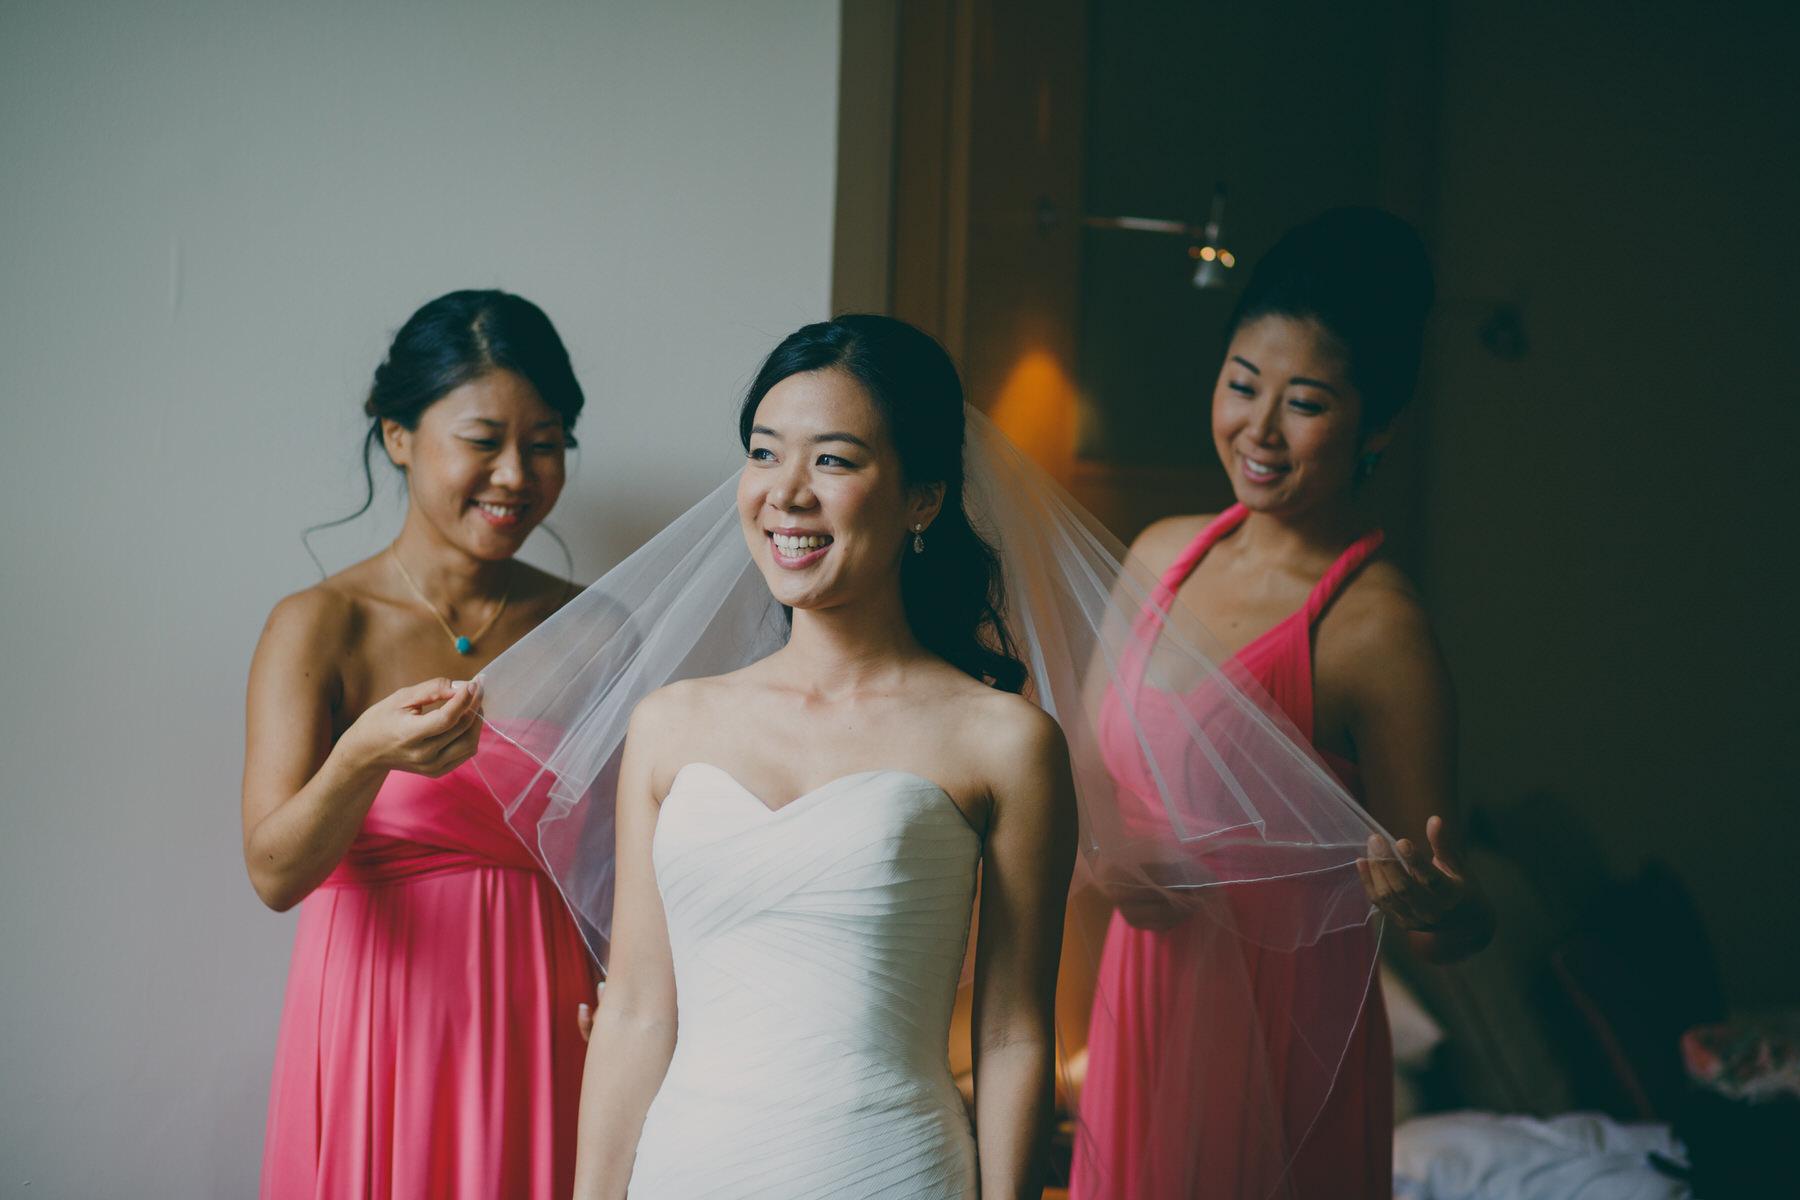 81 bridesmaids hot pink dresses fix brides veil Enzoani dress.jpg